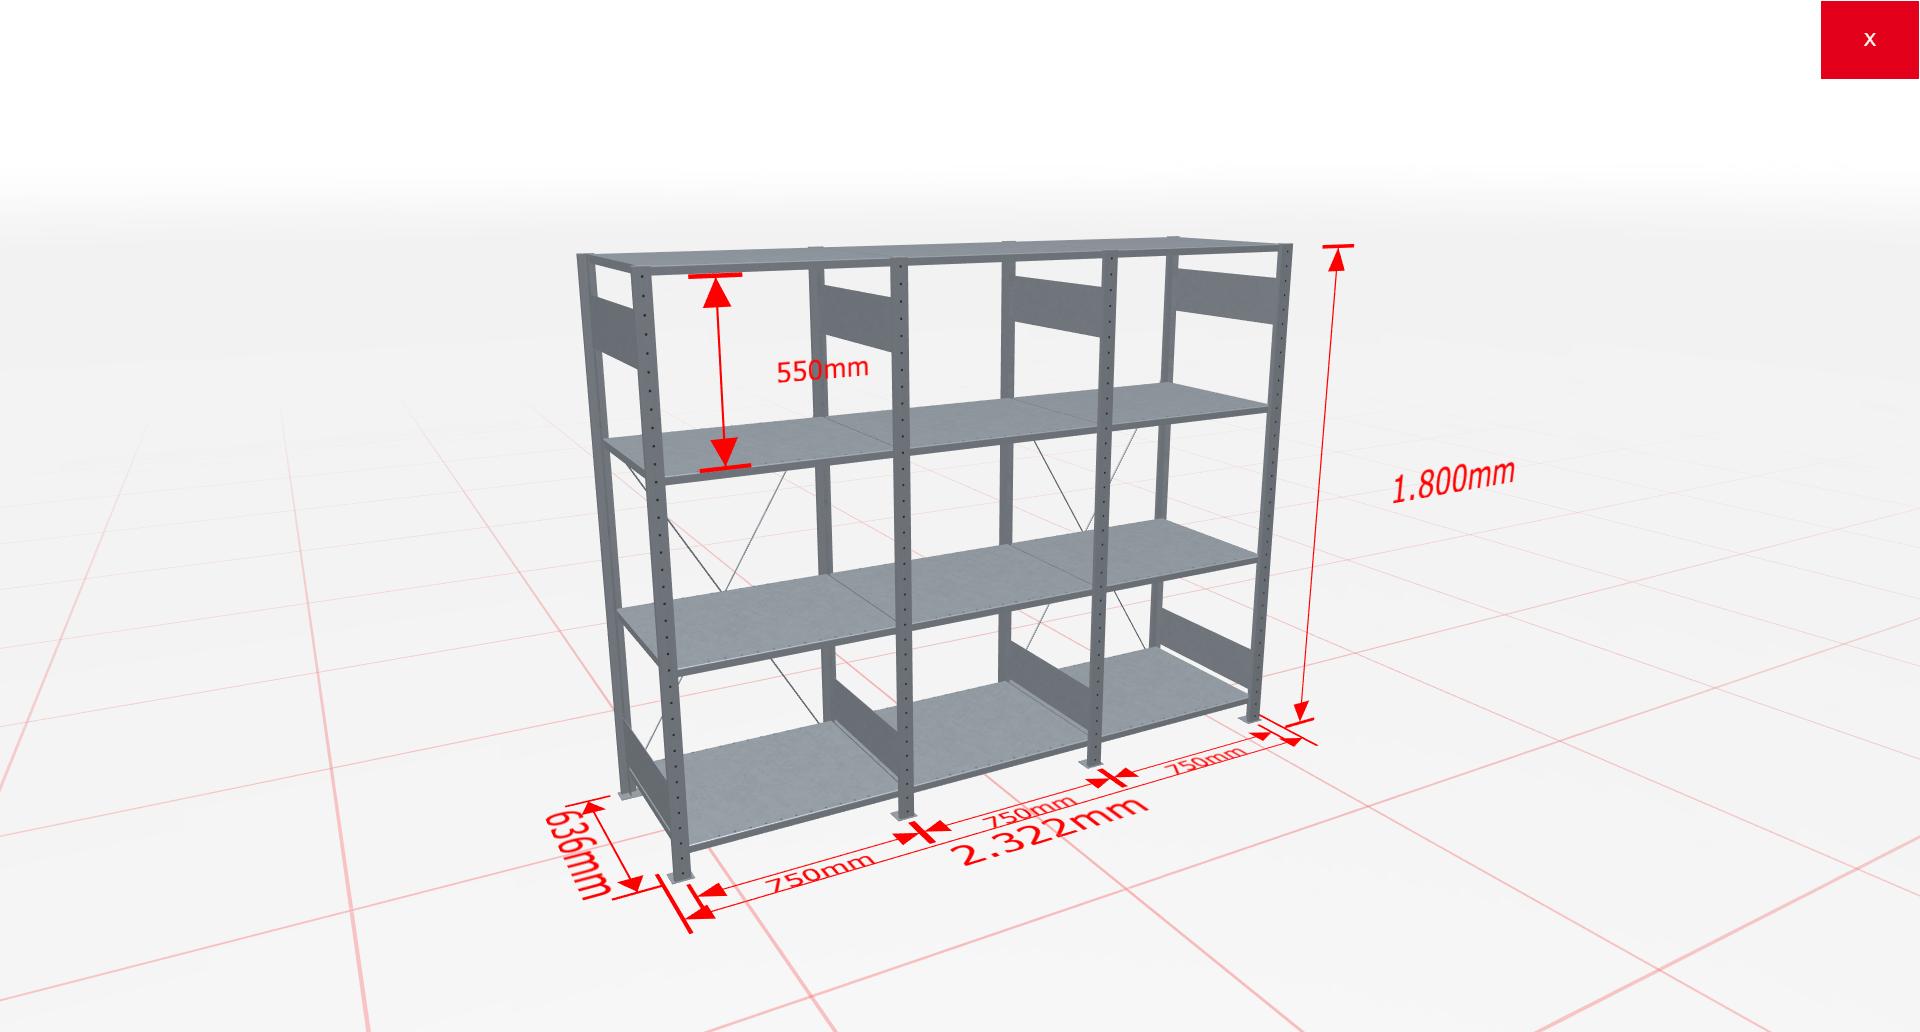 Fachbodenregal Komplettregal 1800x2322x600 mm (HxBxT) SCHULTE Lagertechnik verzinkt 4 Ebenen  150 kg je Boden